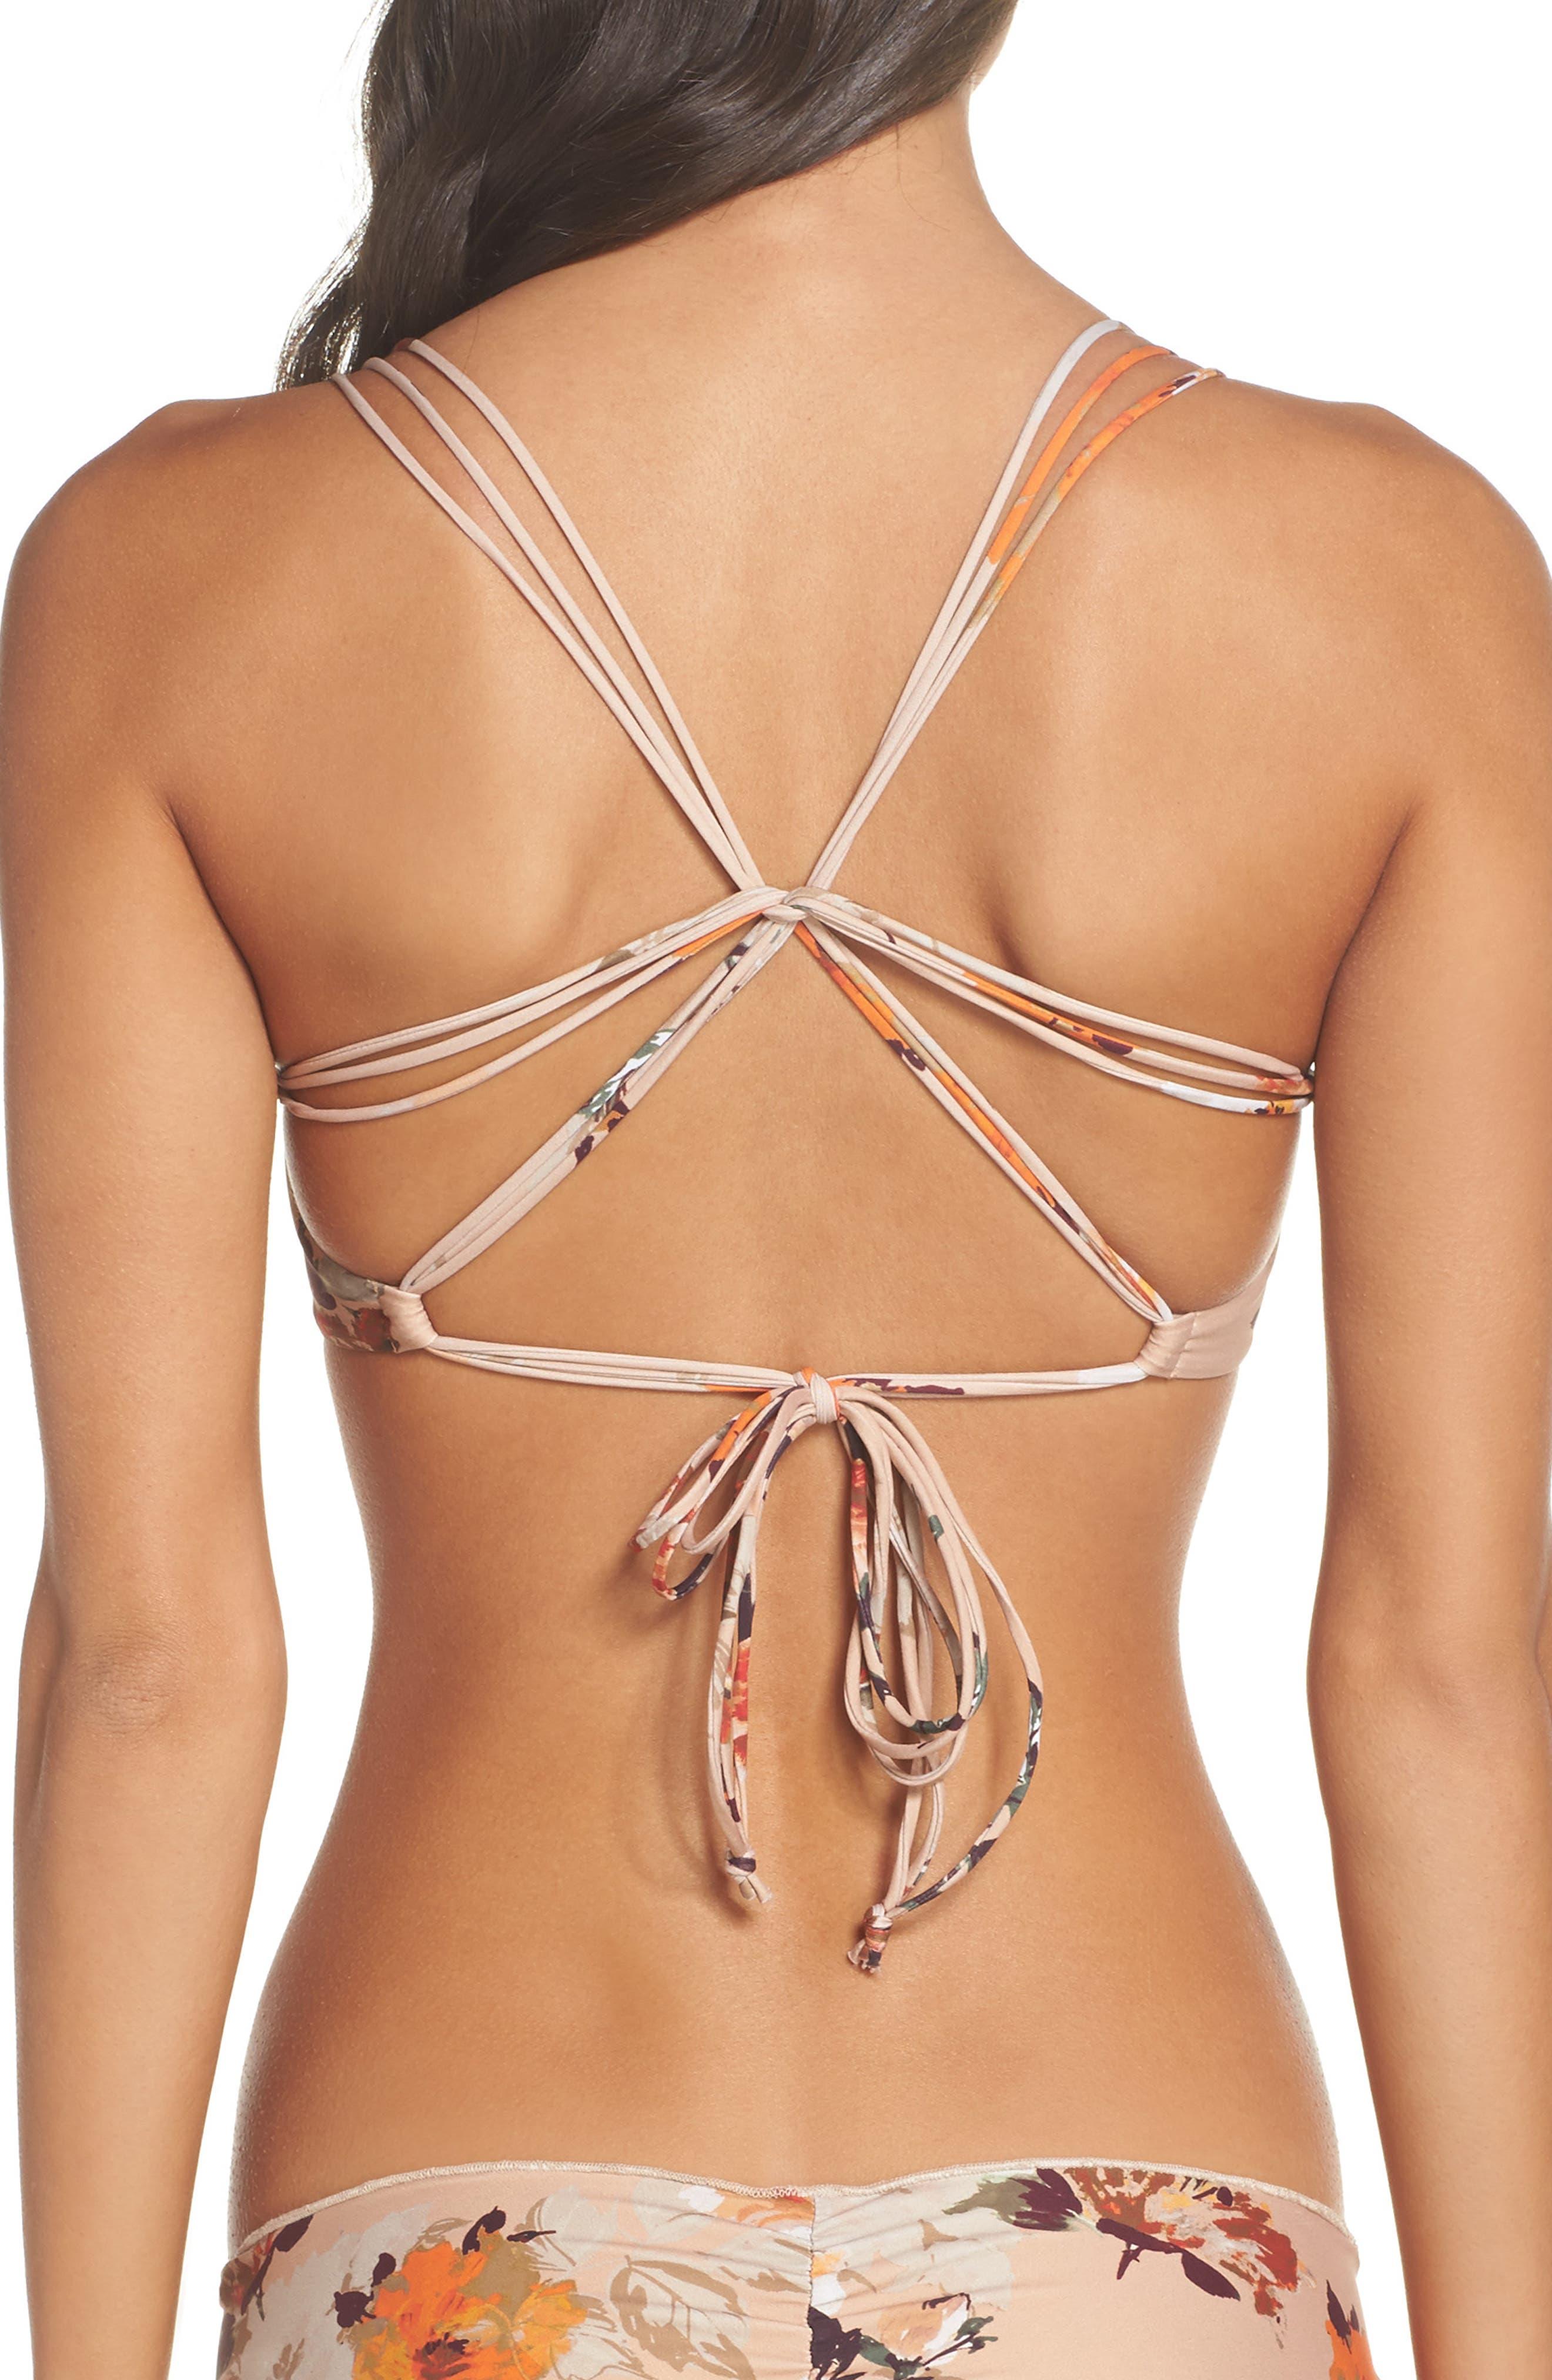 Alternate Image 2  - Boys + Arrows Dylan the Desperado Bikini Top